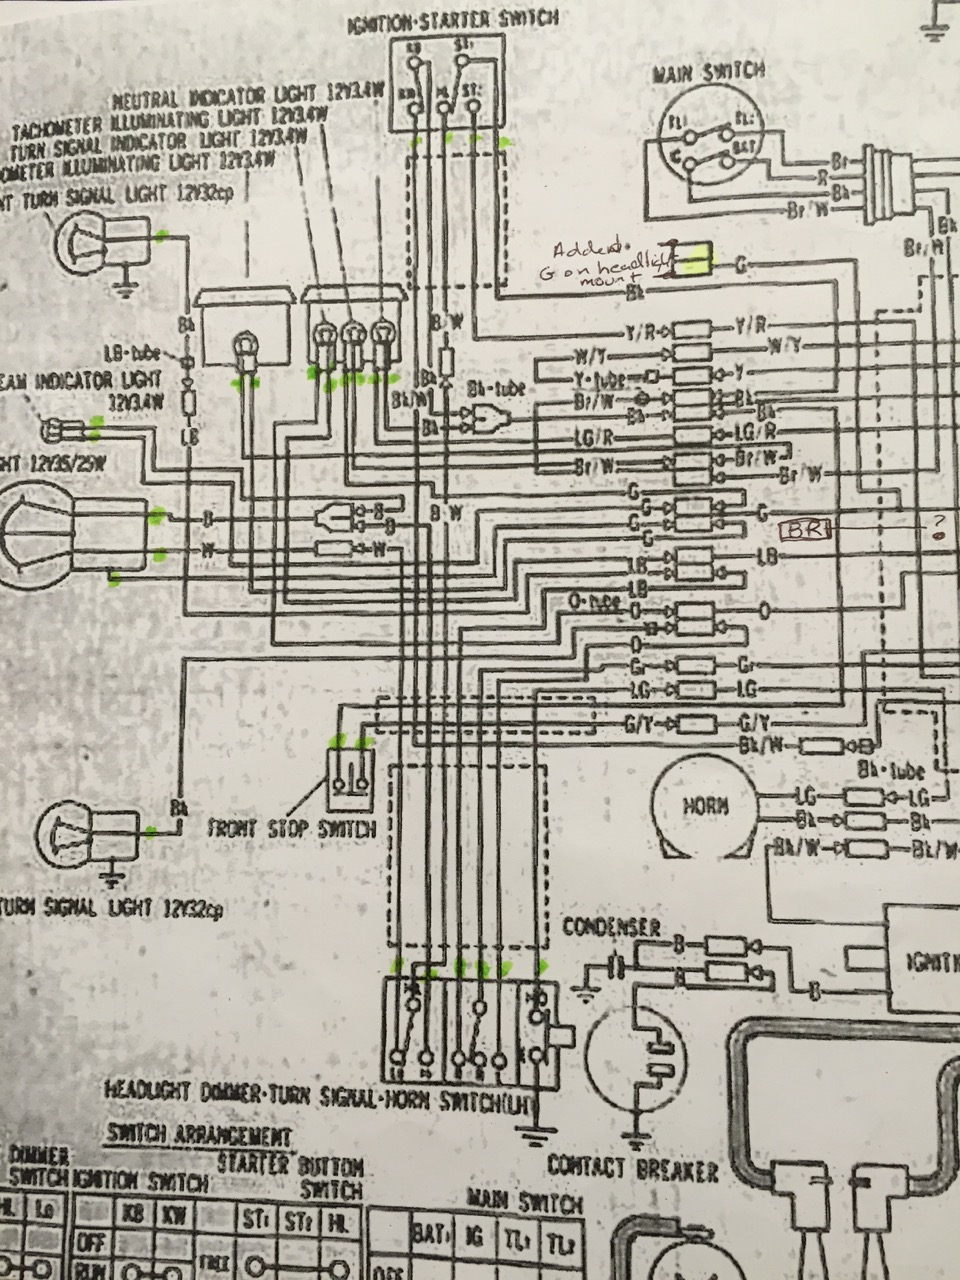 cb200 wiring diagram electrical diagrams forum u2022 rh jimmellon co uk honda cbx wiring diagram cbx 100 wiring diagram